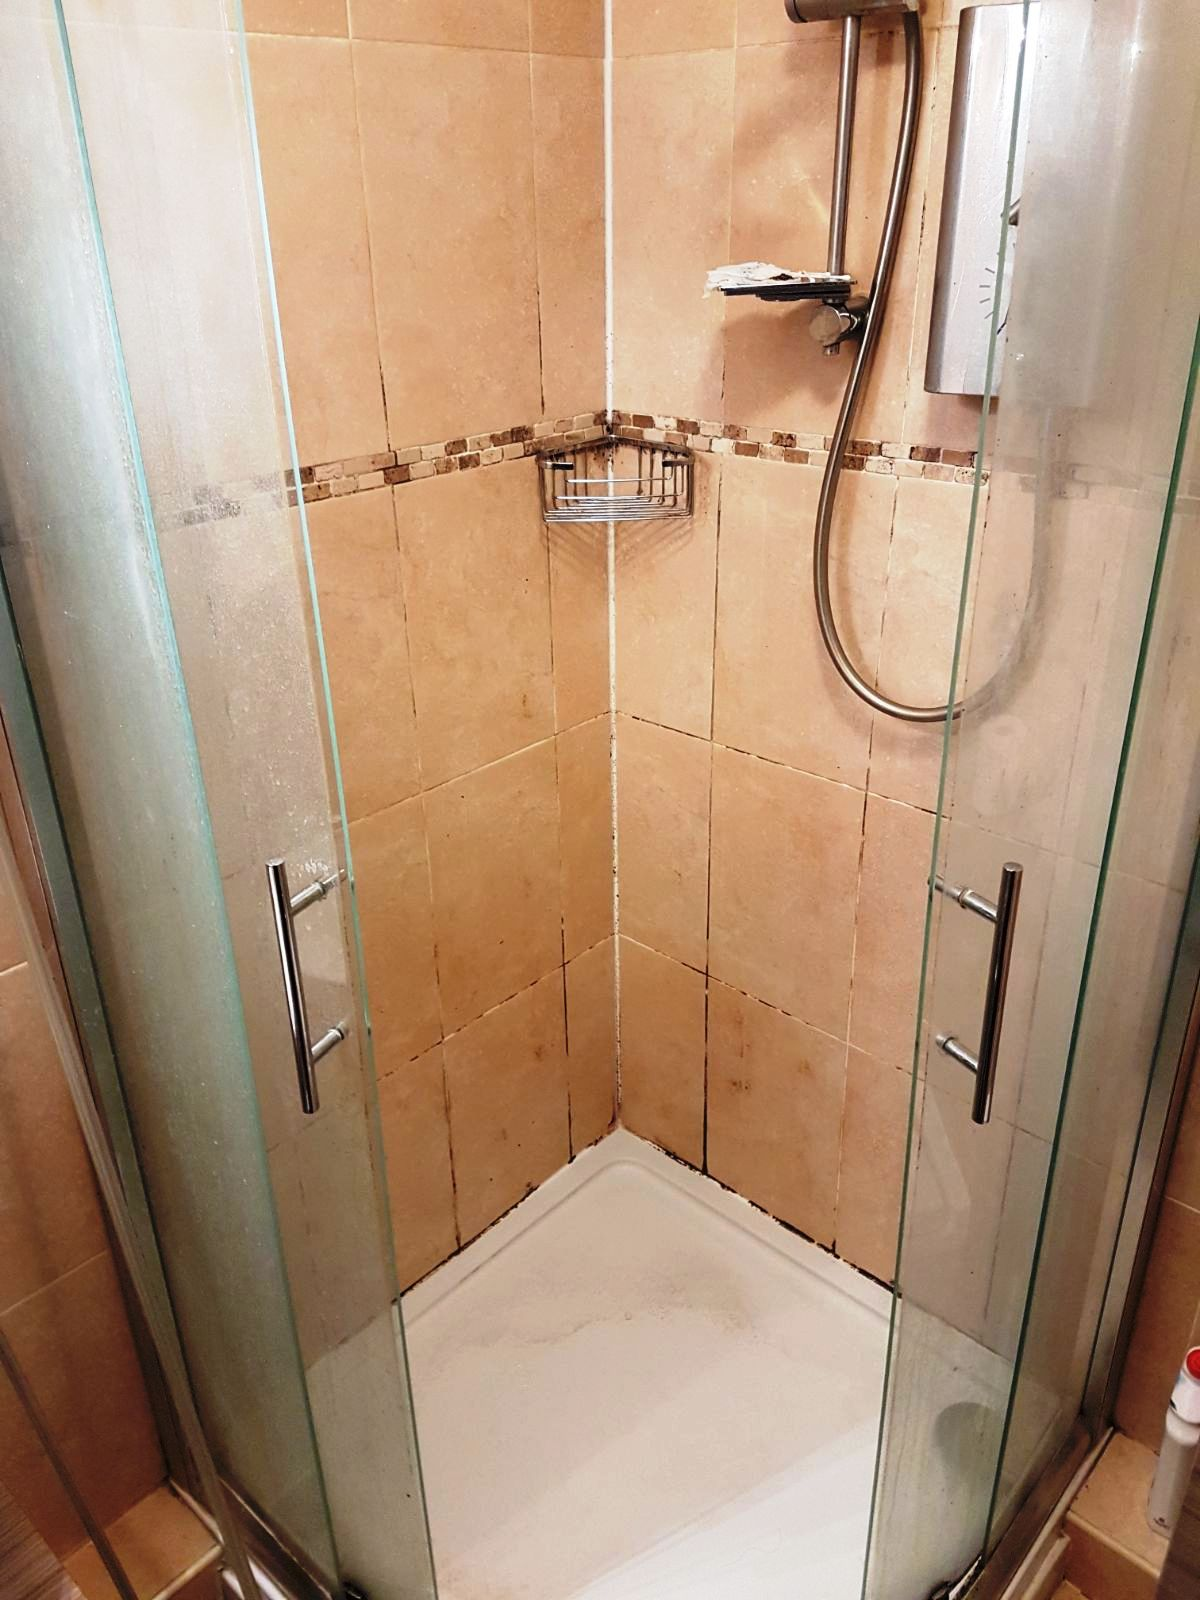 Ceramic Tiled Shower Cubicle Before Cleaning Uxbridge